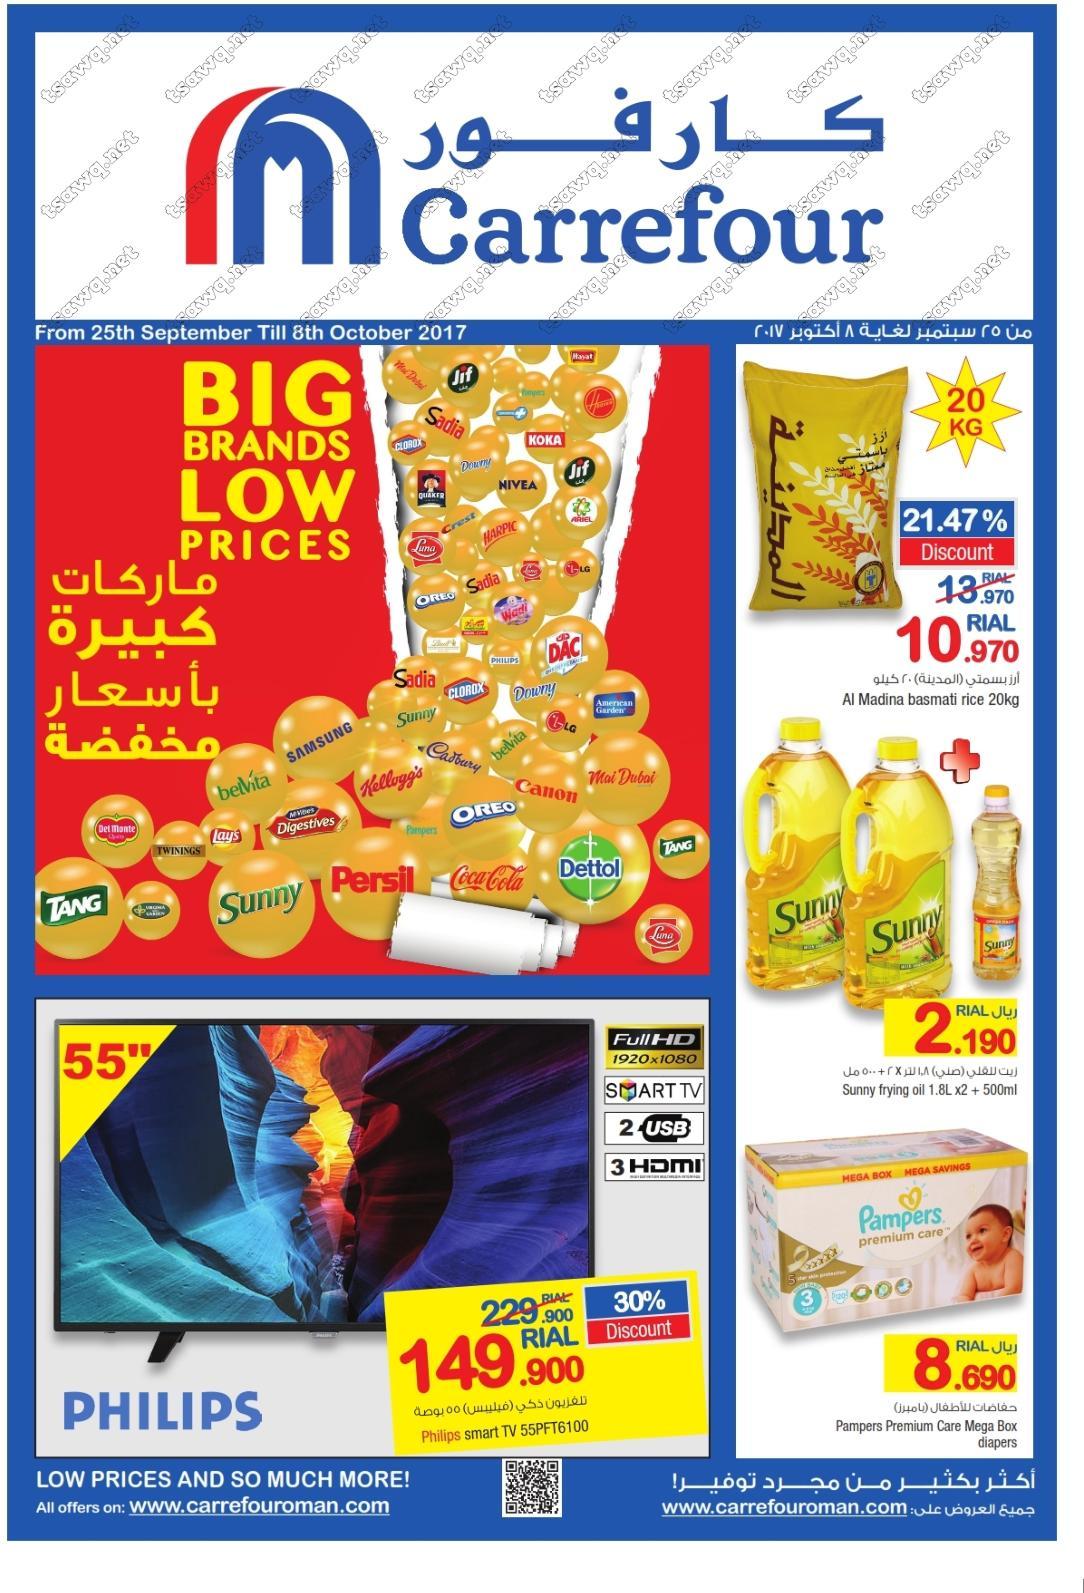 b2f575366 عروض كارفور عمان من 25 سبتمبر حتى 8 أكتوبر 2017 ماركات كبيرة | تسوق نت